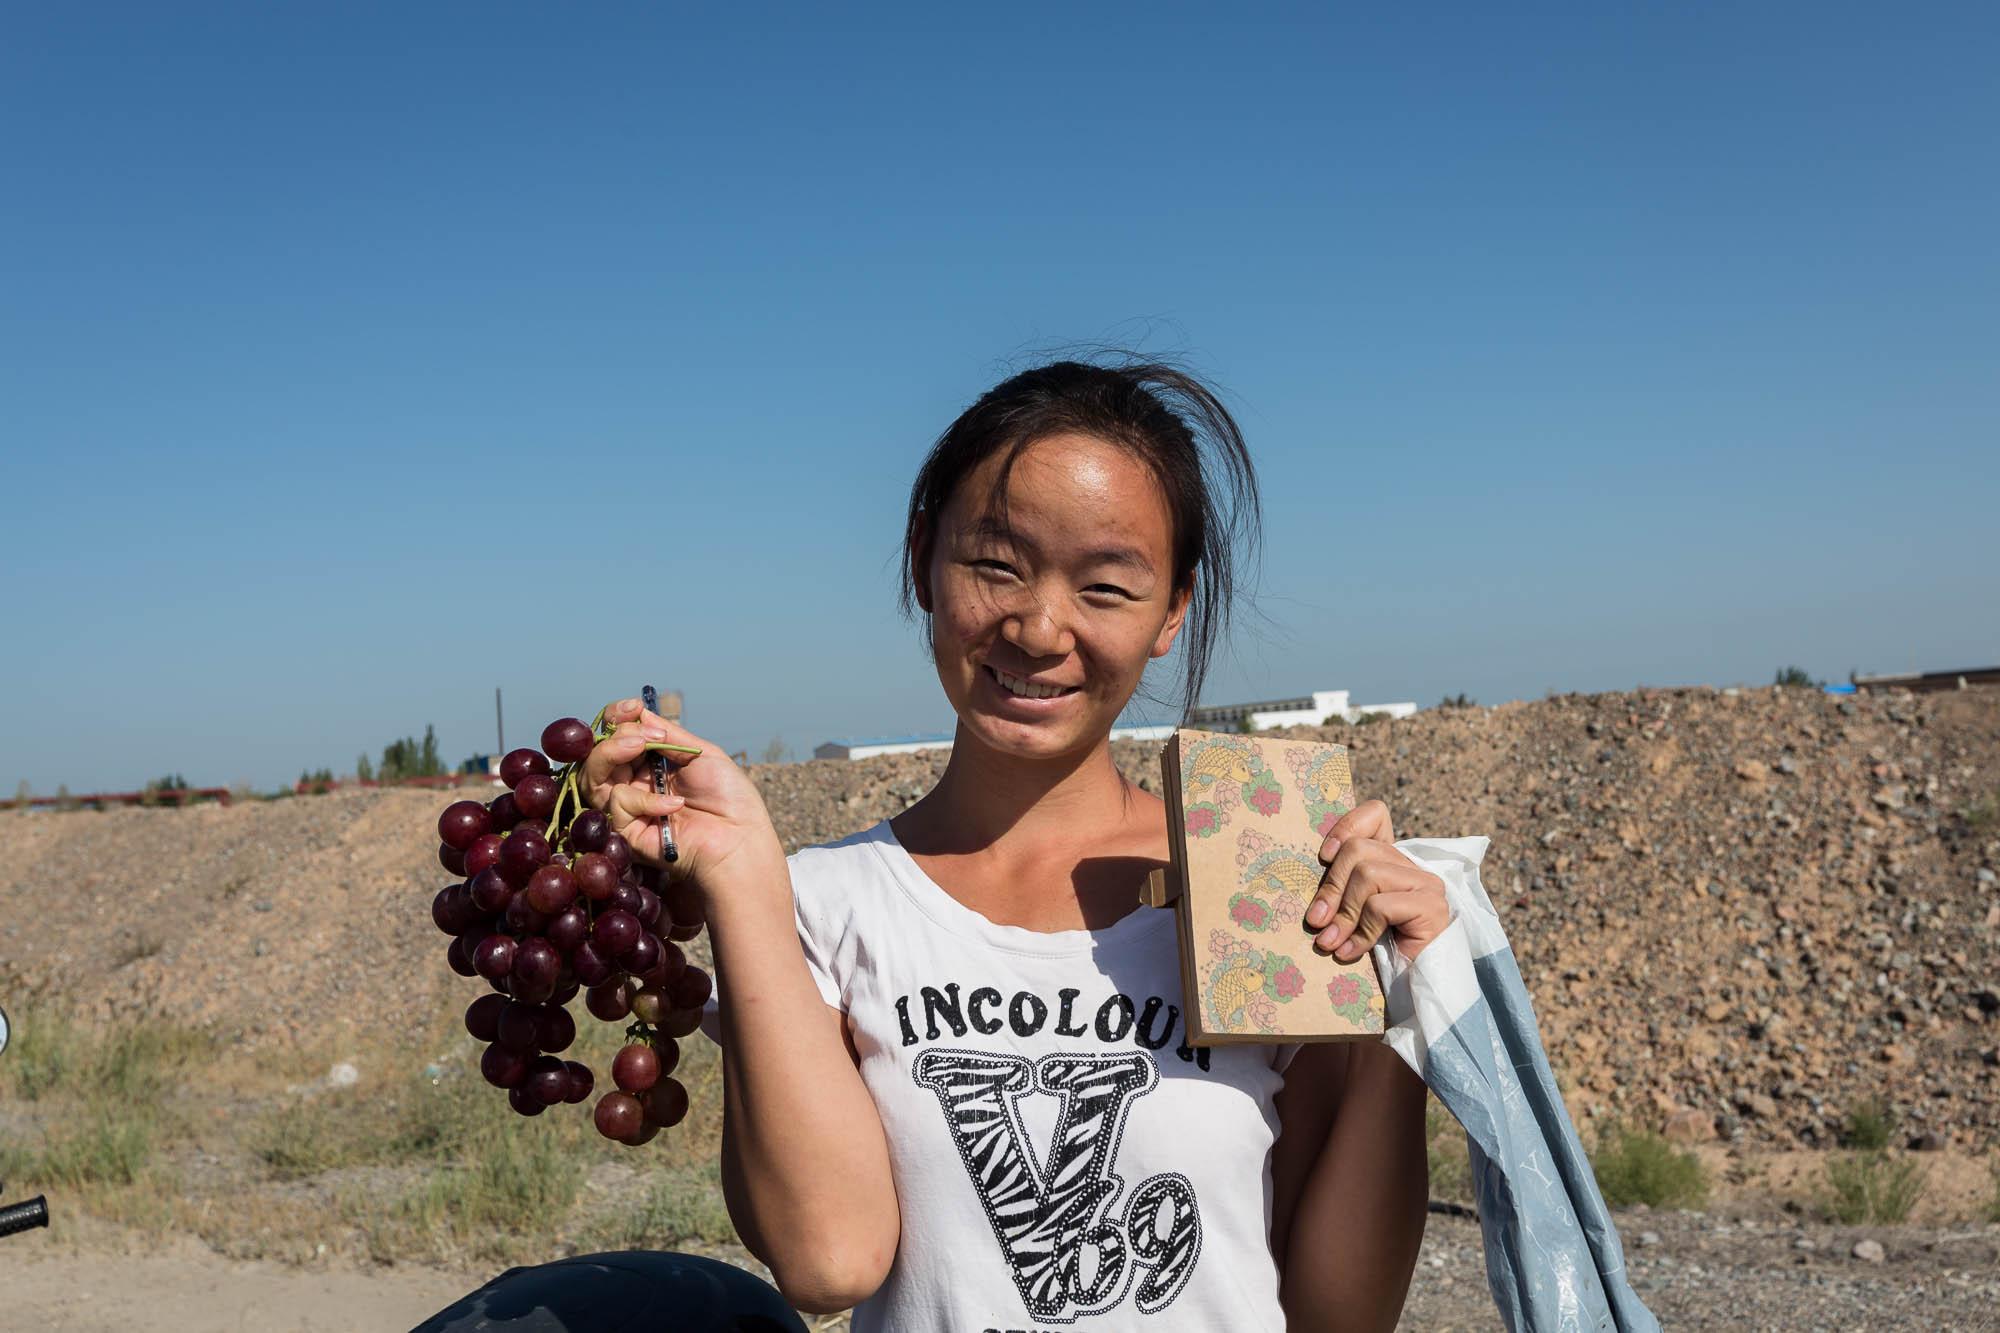 Xiao Huiru gave me grapes and kept me company